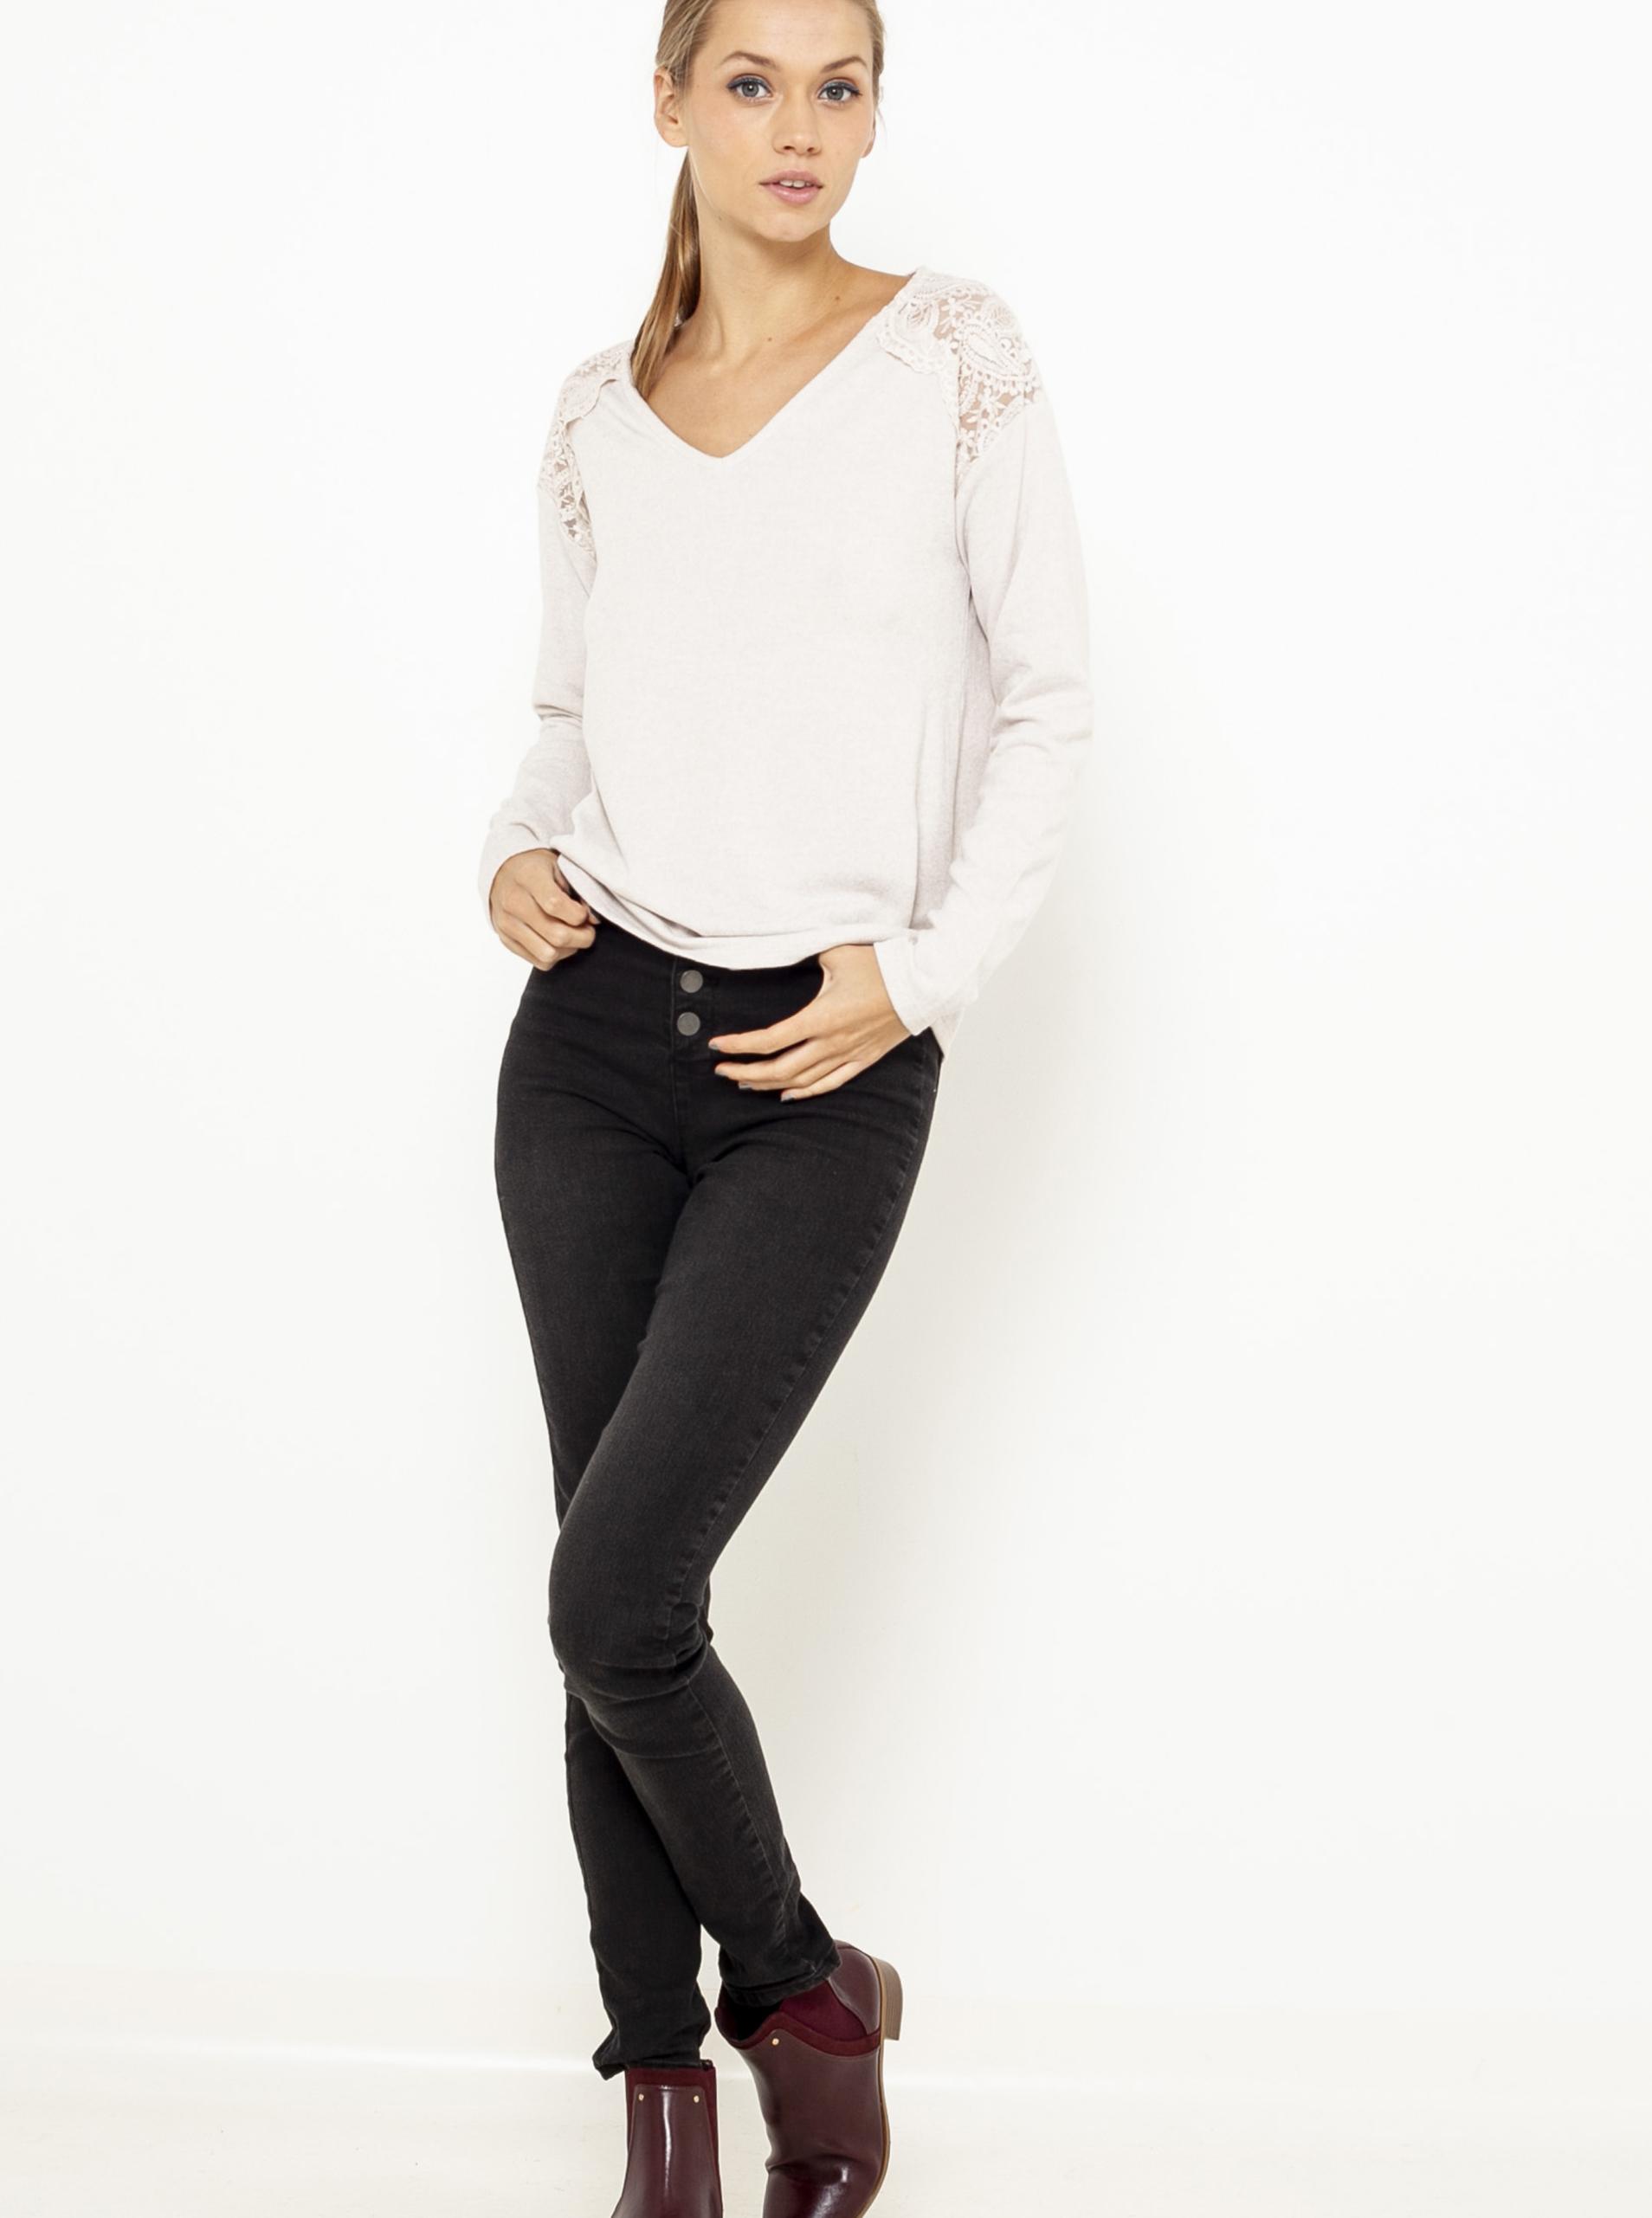 CAMAIEU smetanové/krémové dámské tričko s krajkou